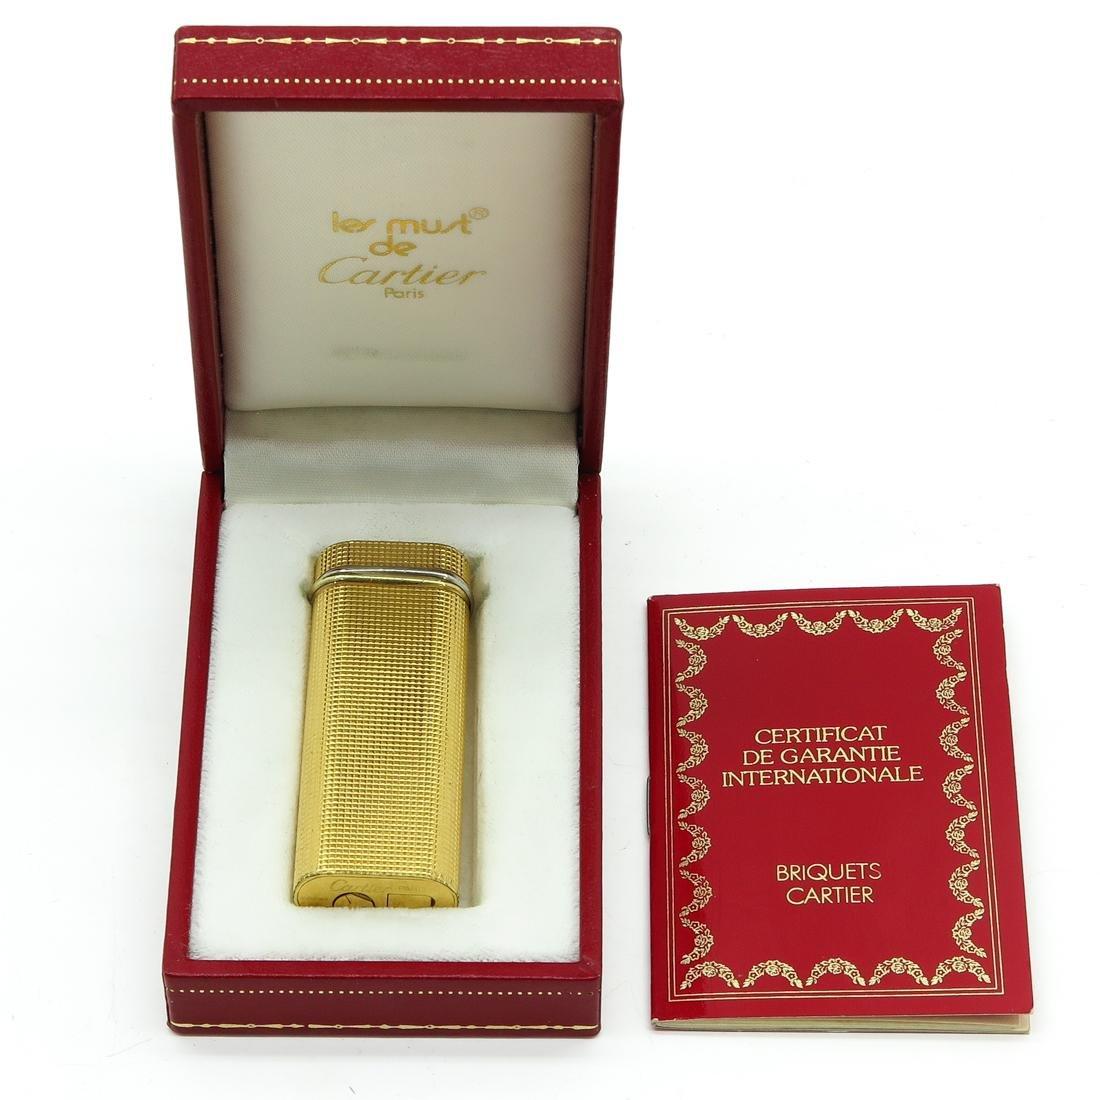 Cartier Lighter in Box